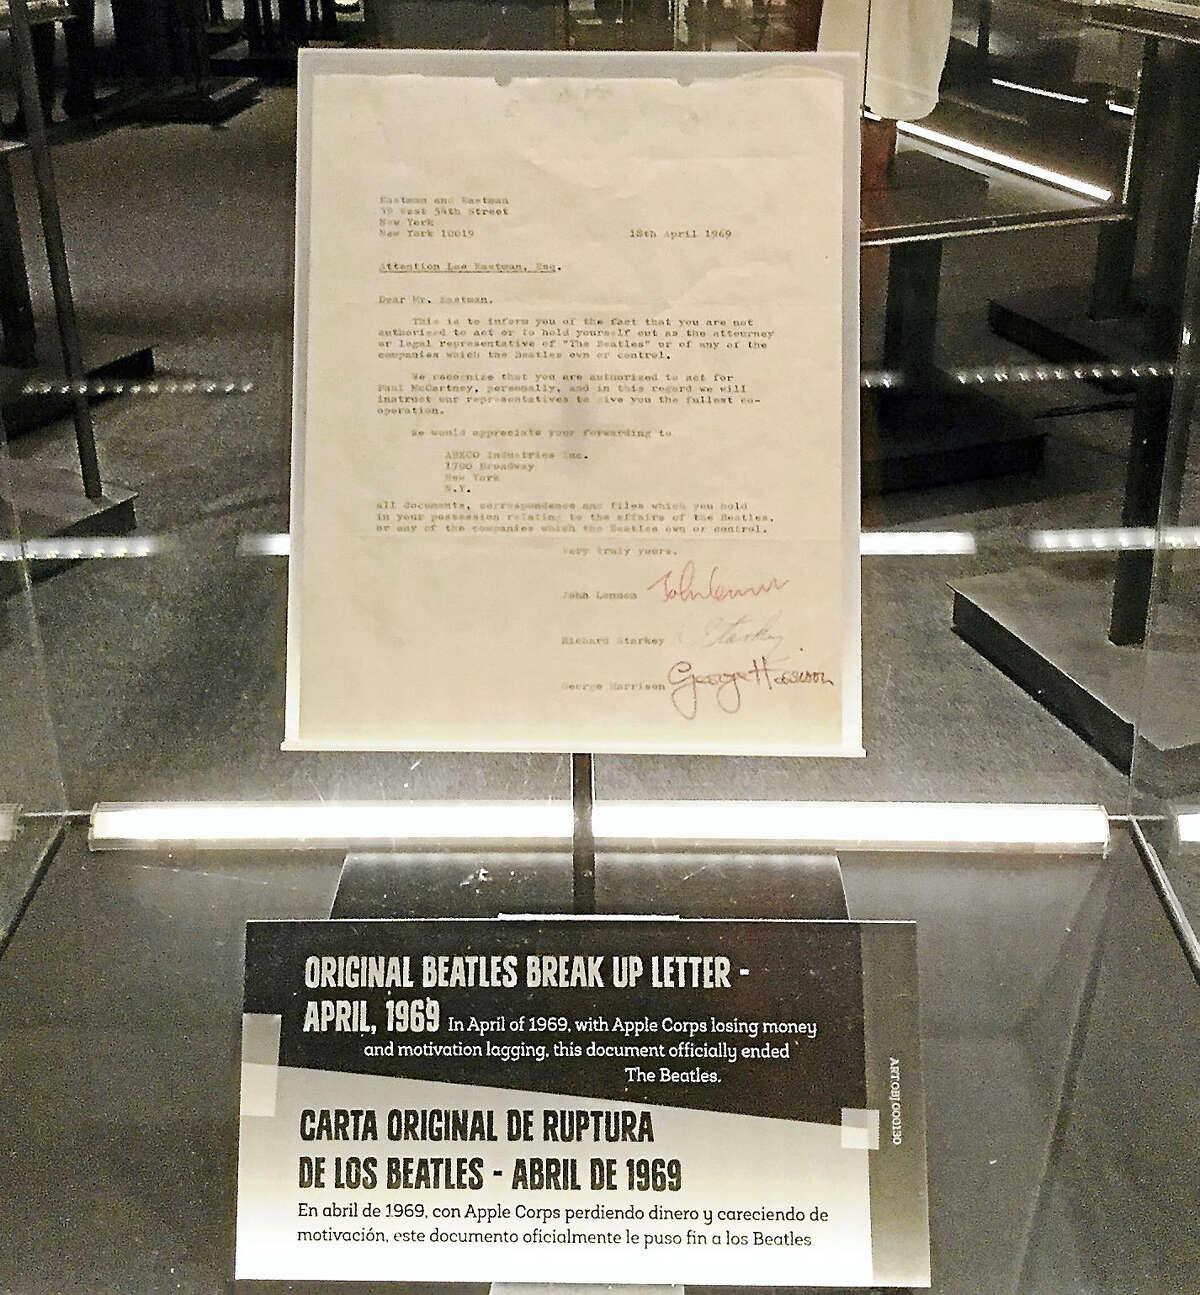 The Beatles breakup letter in 1969.